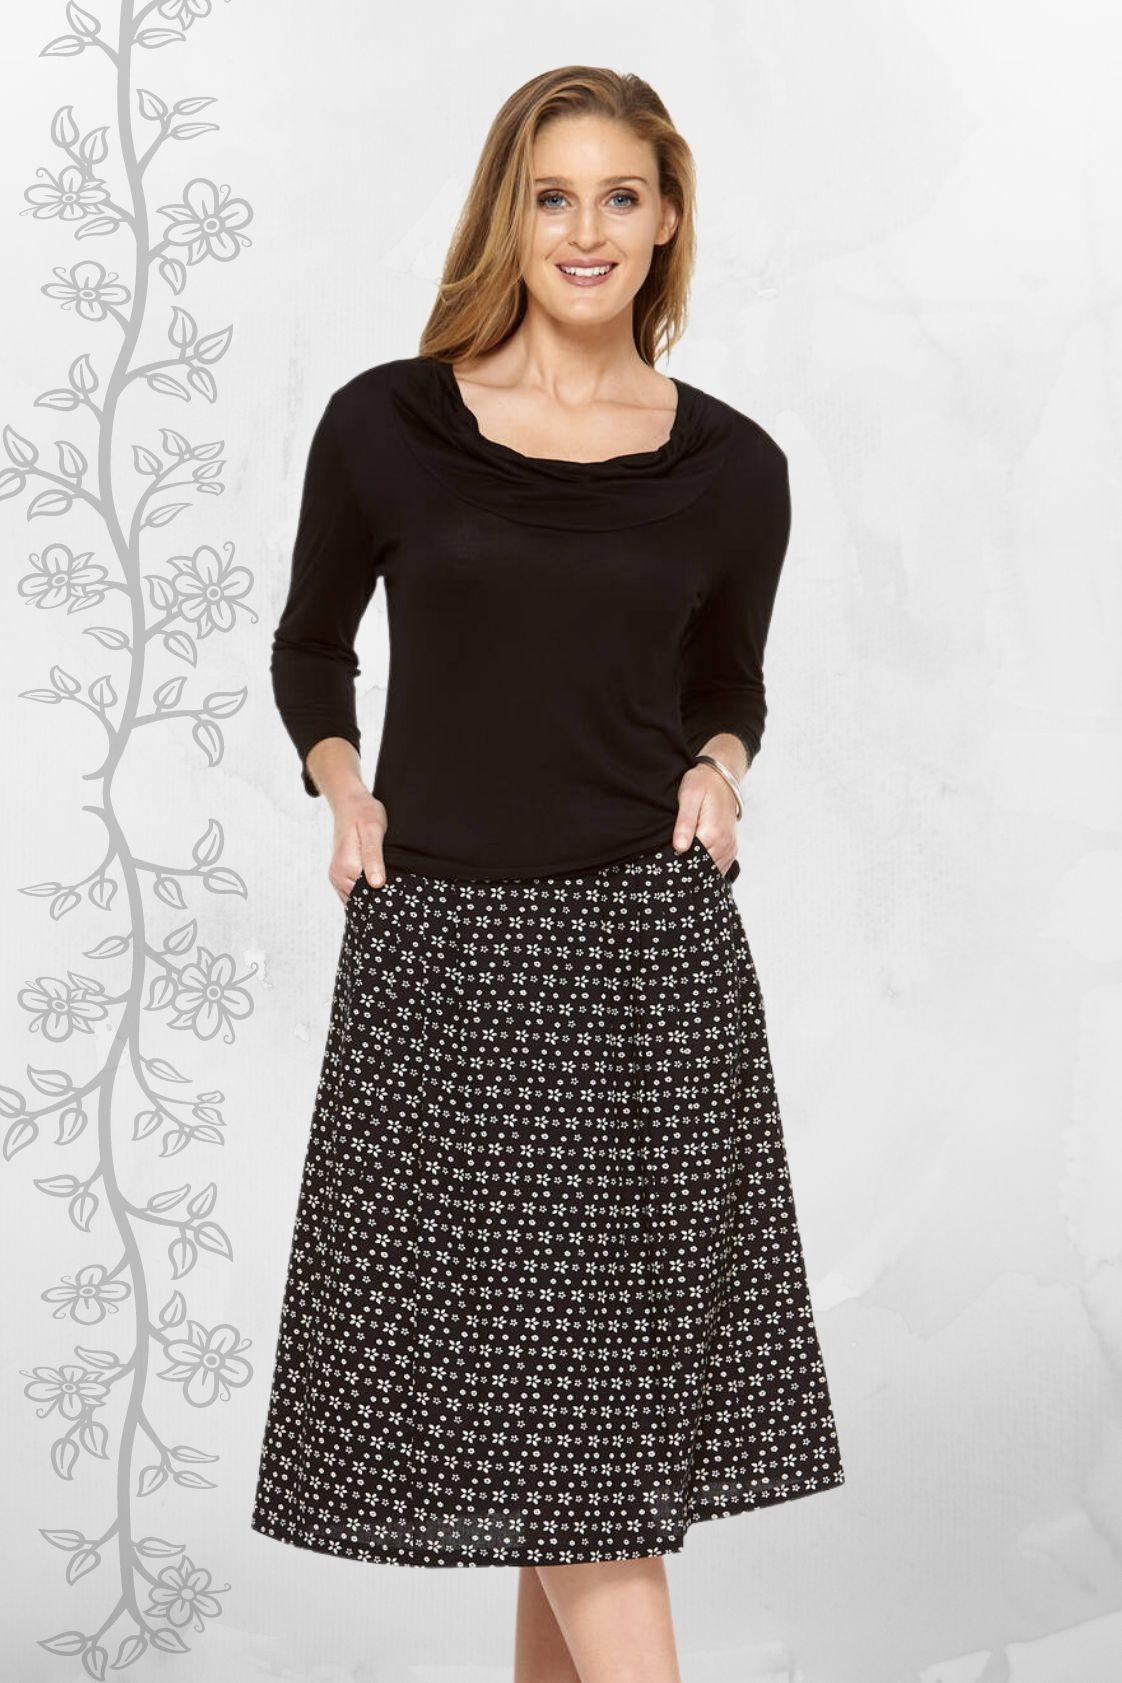 Jessica Cotton Skirt with Pockets - Ditsy Black Print